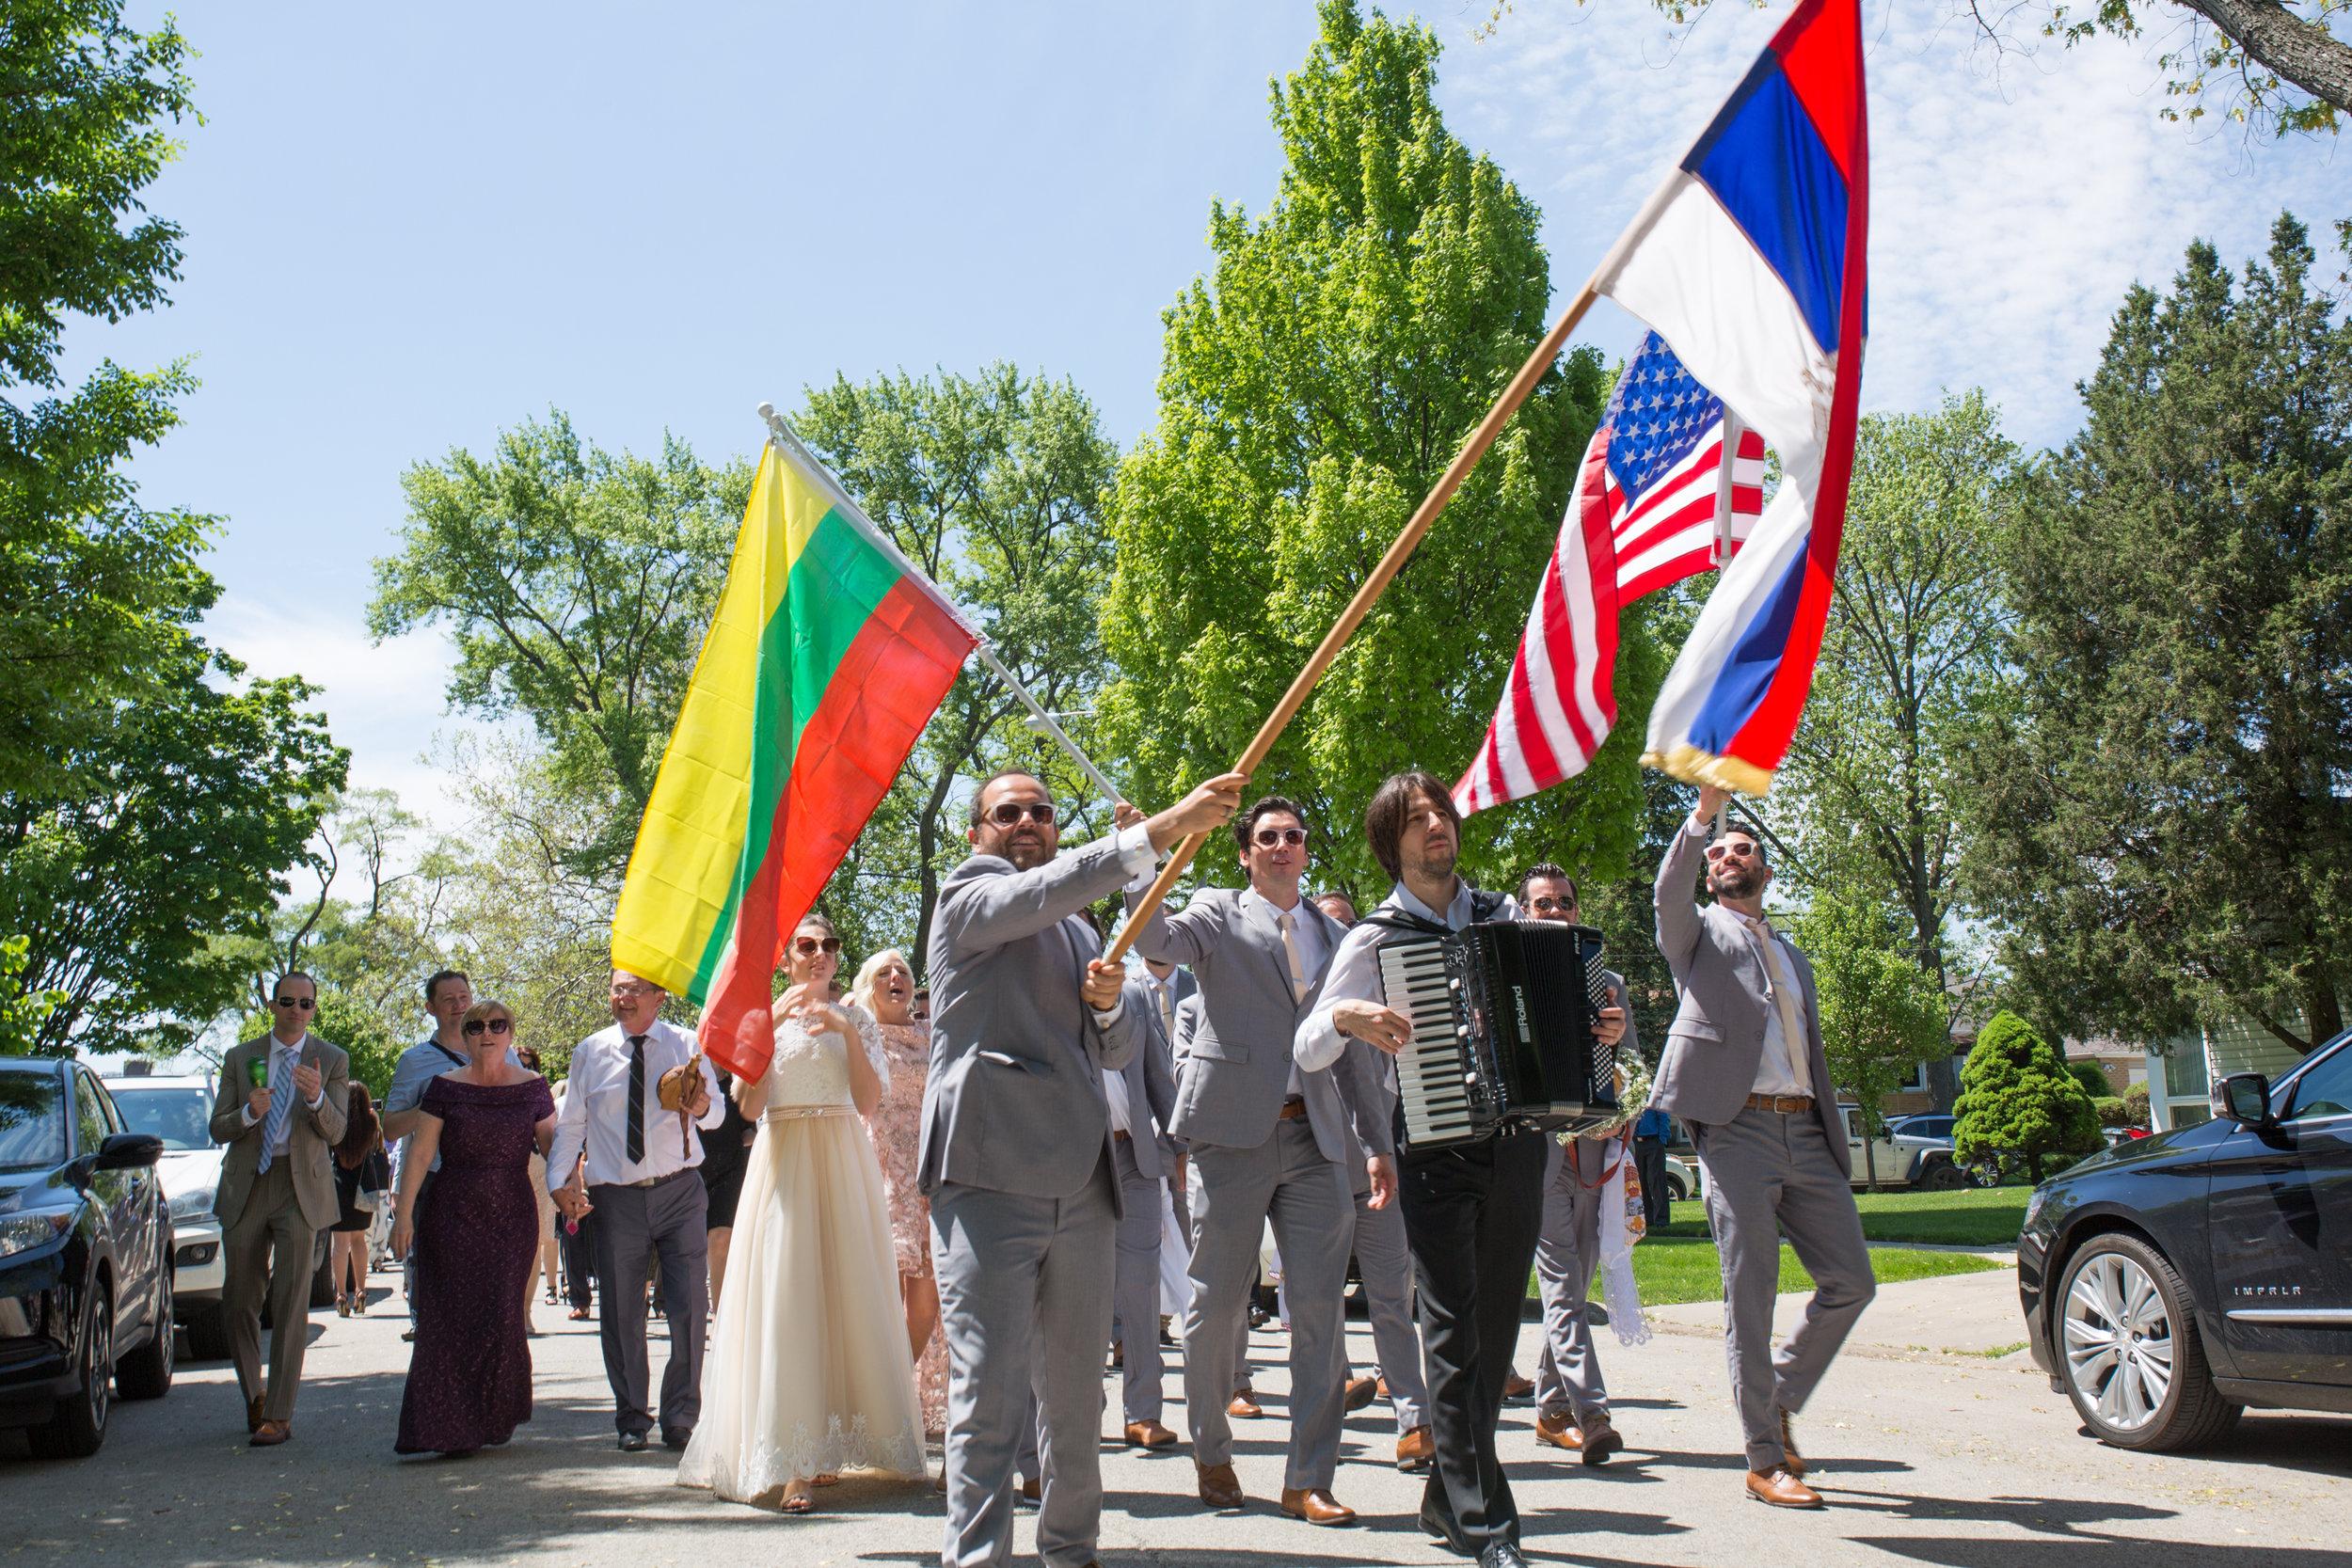 Chicago Serbian Wedding Parade